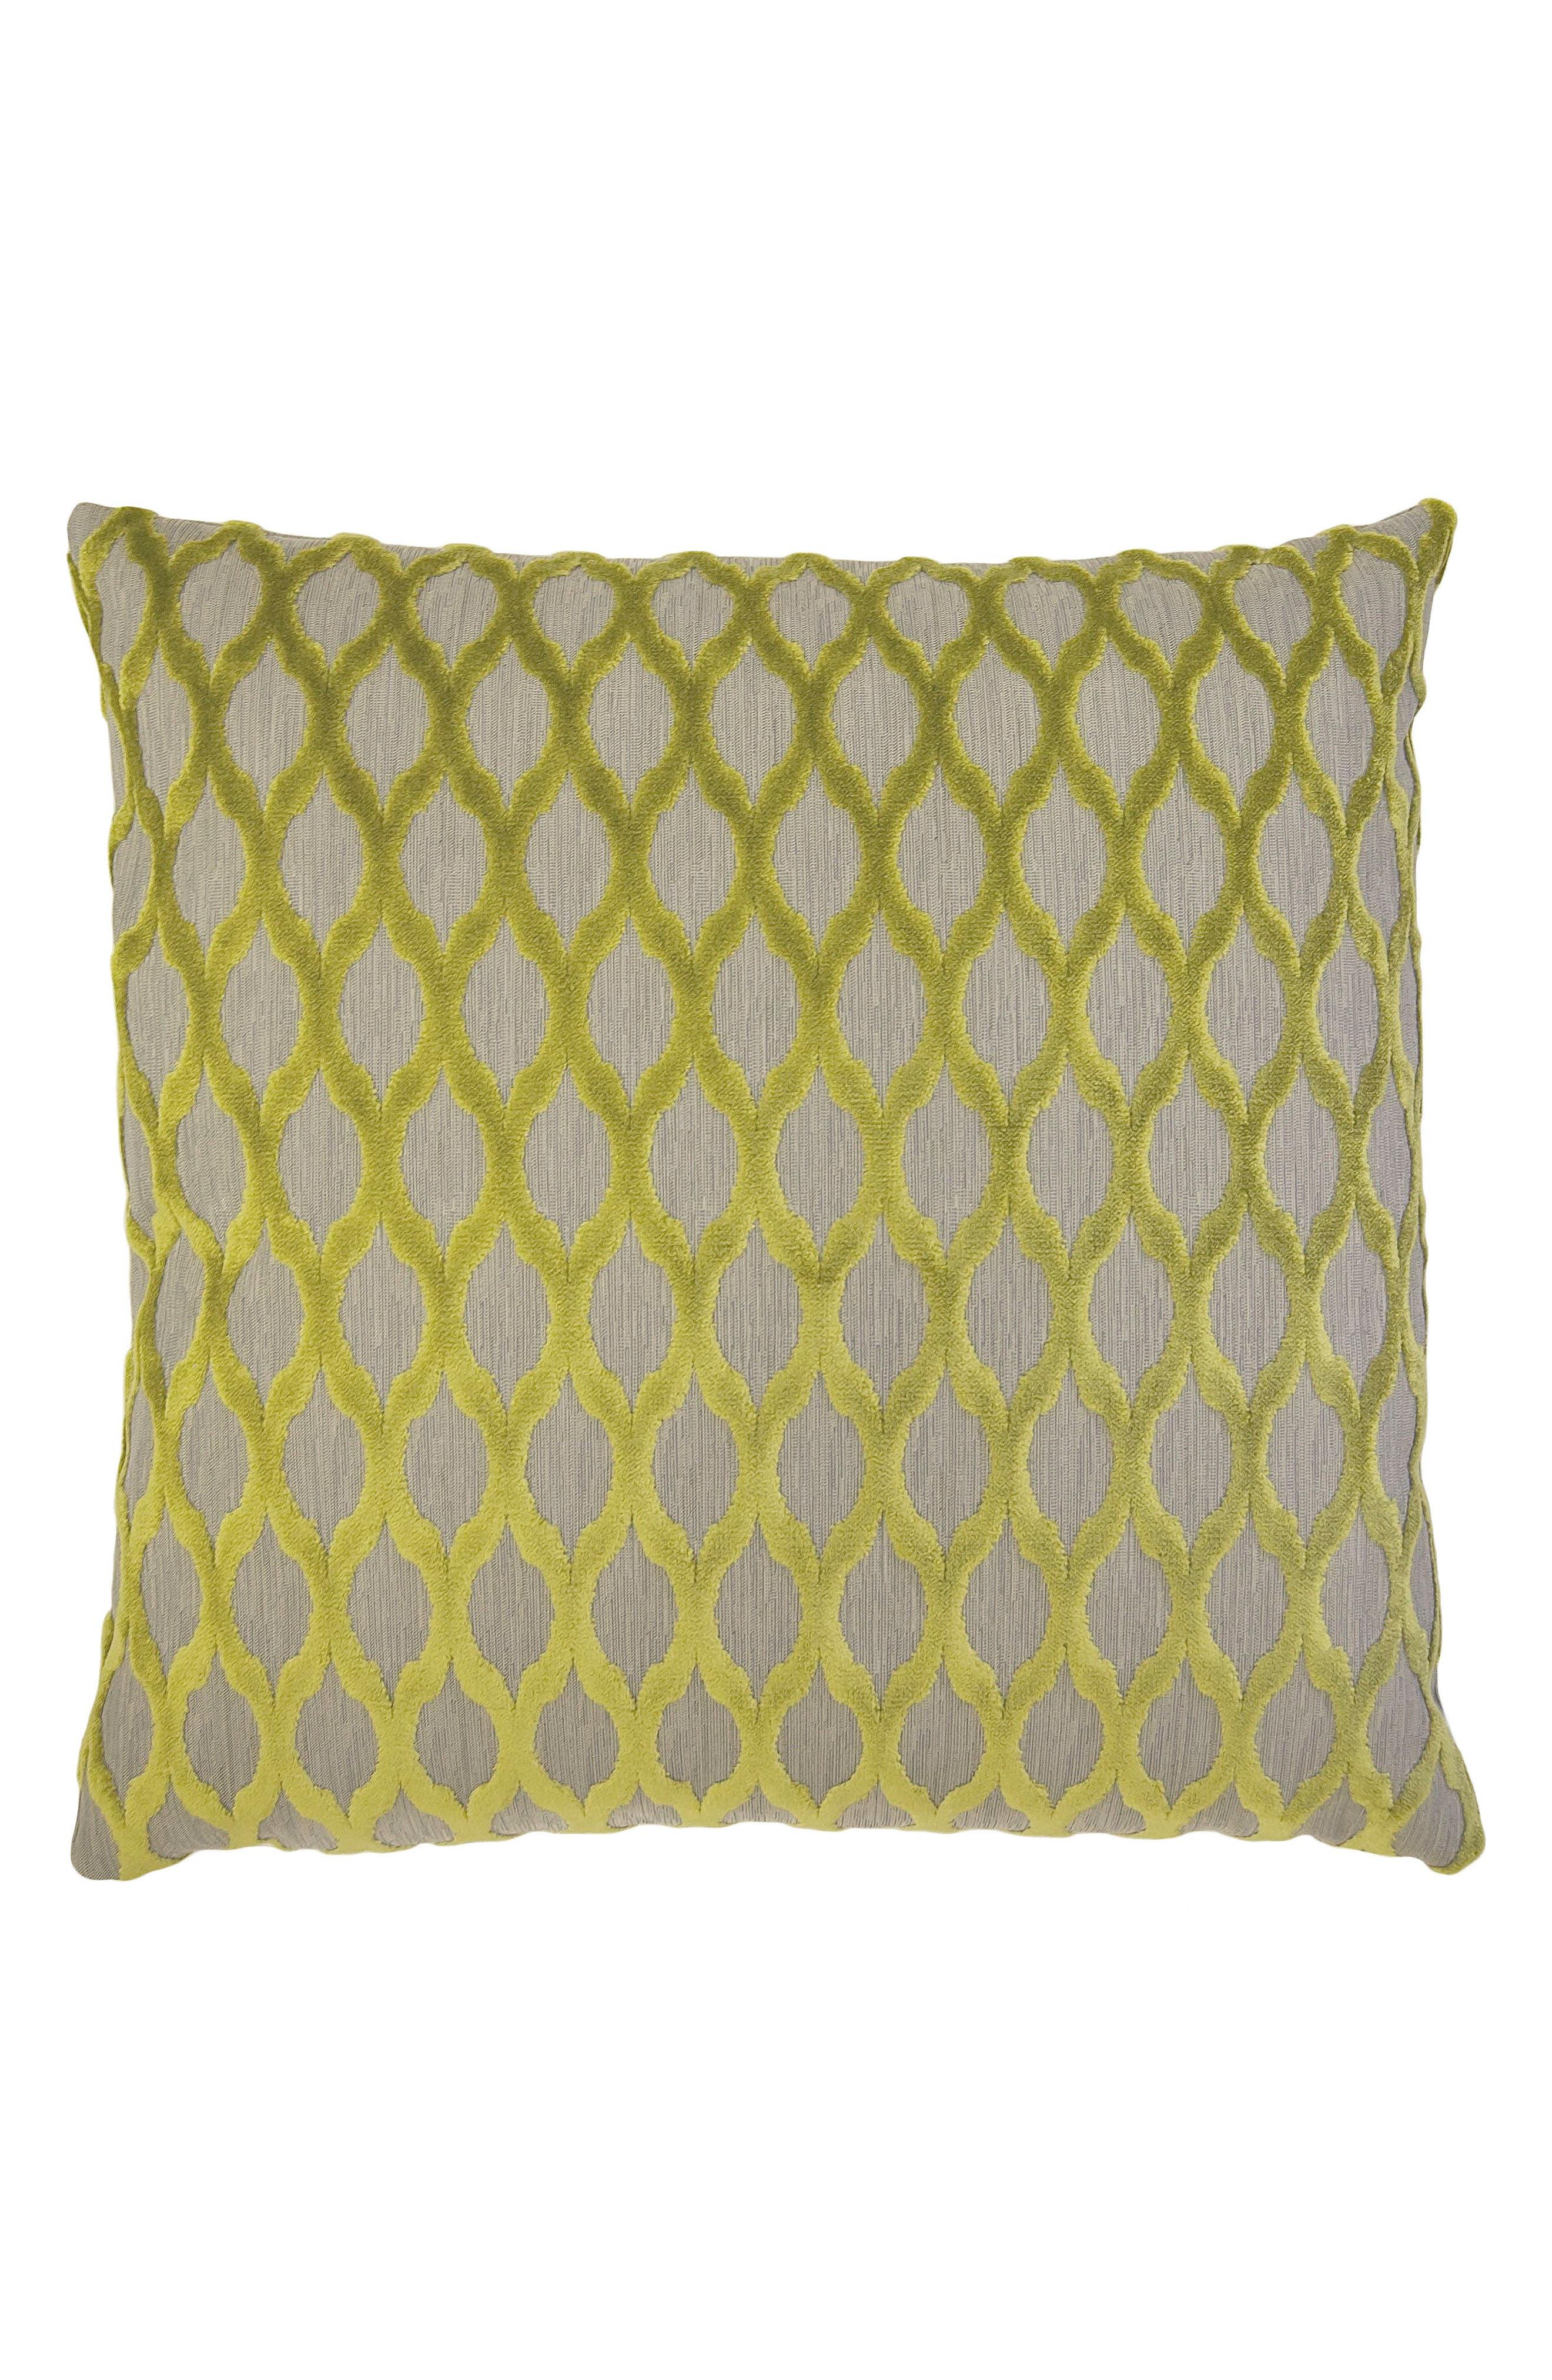 Lattice Accent Pillow,                         Main,                         color, GREEN